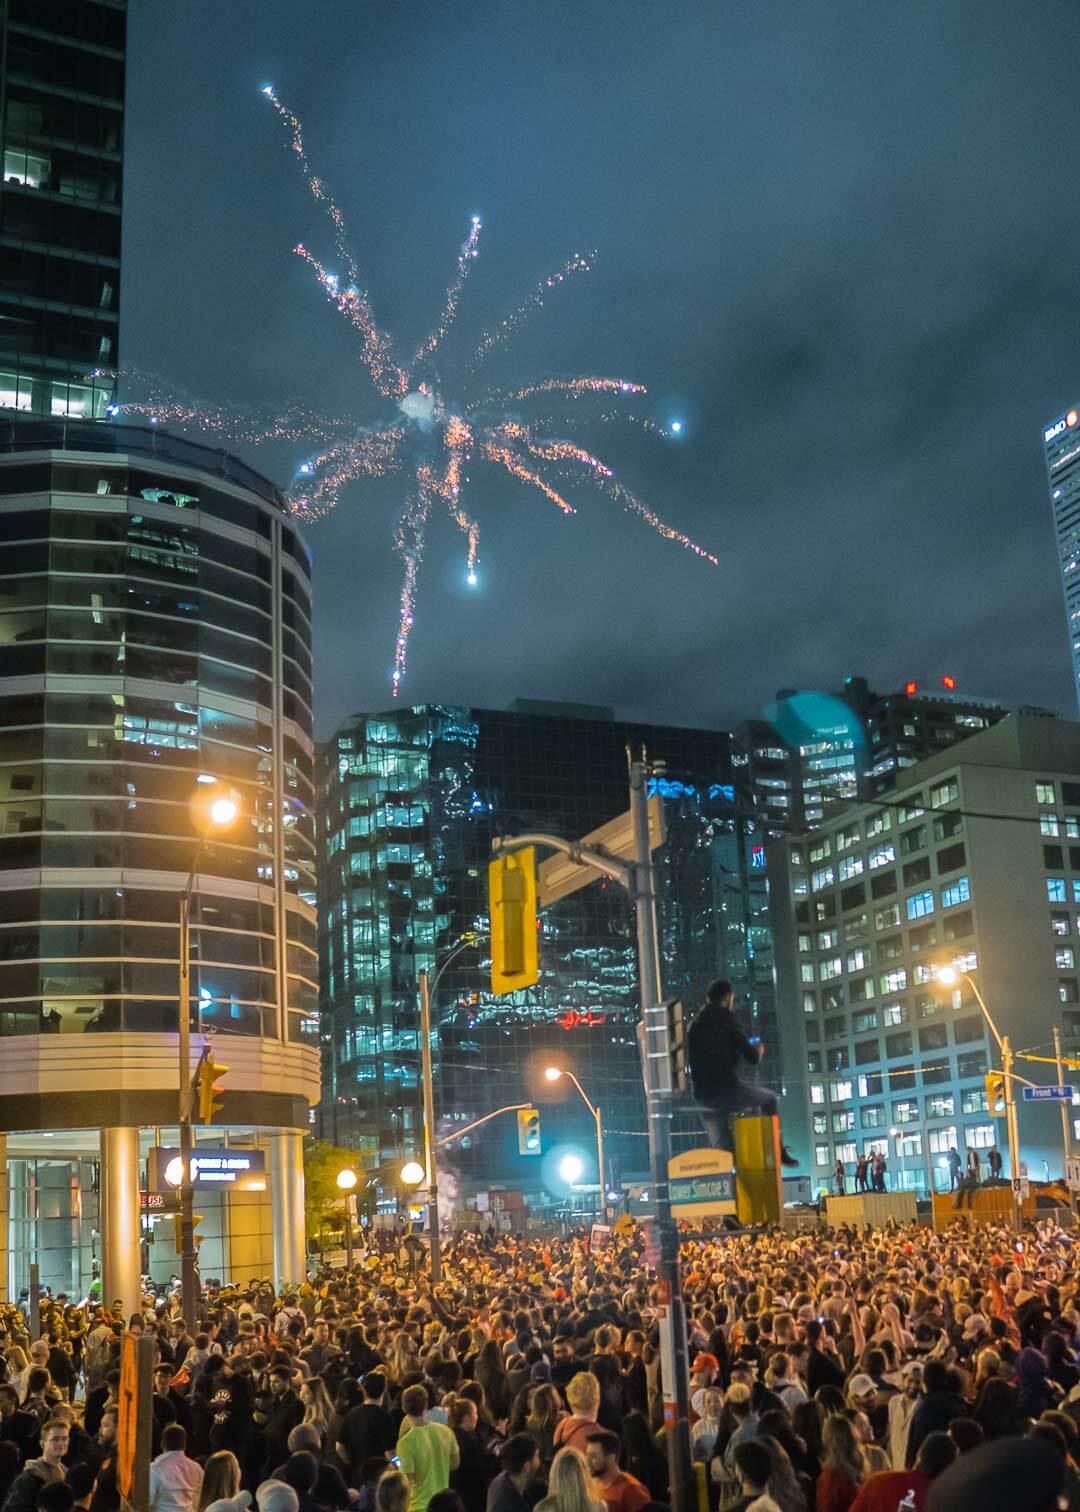 Raptors championship celebration parade - fireworks